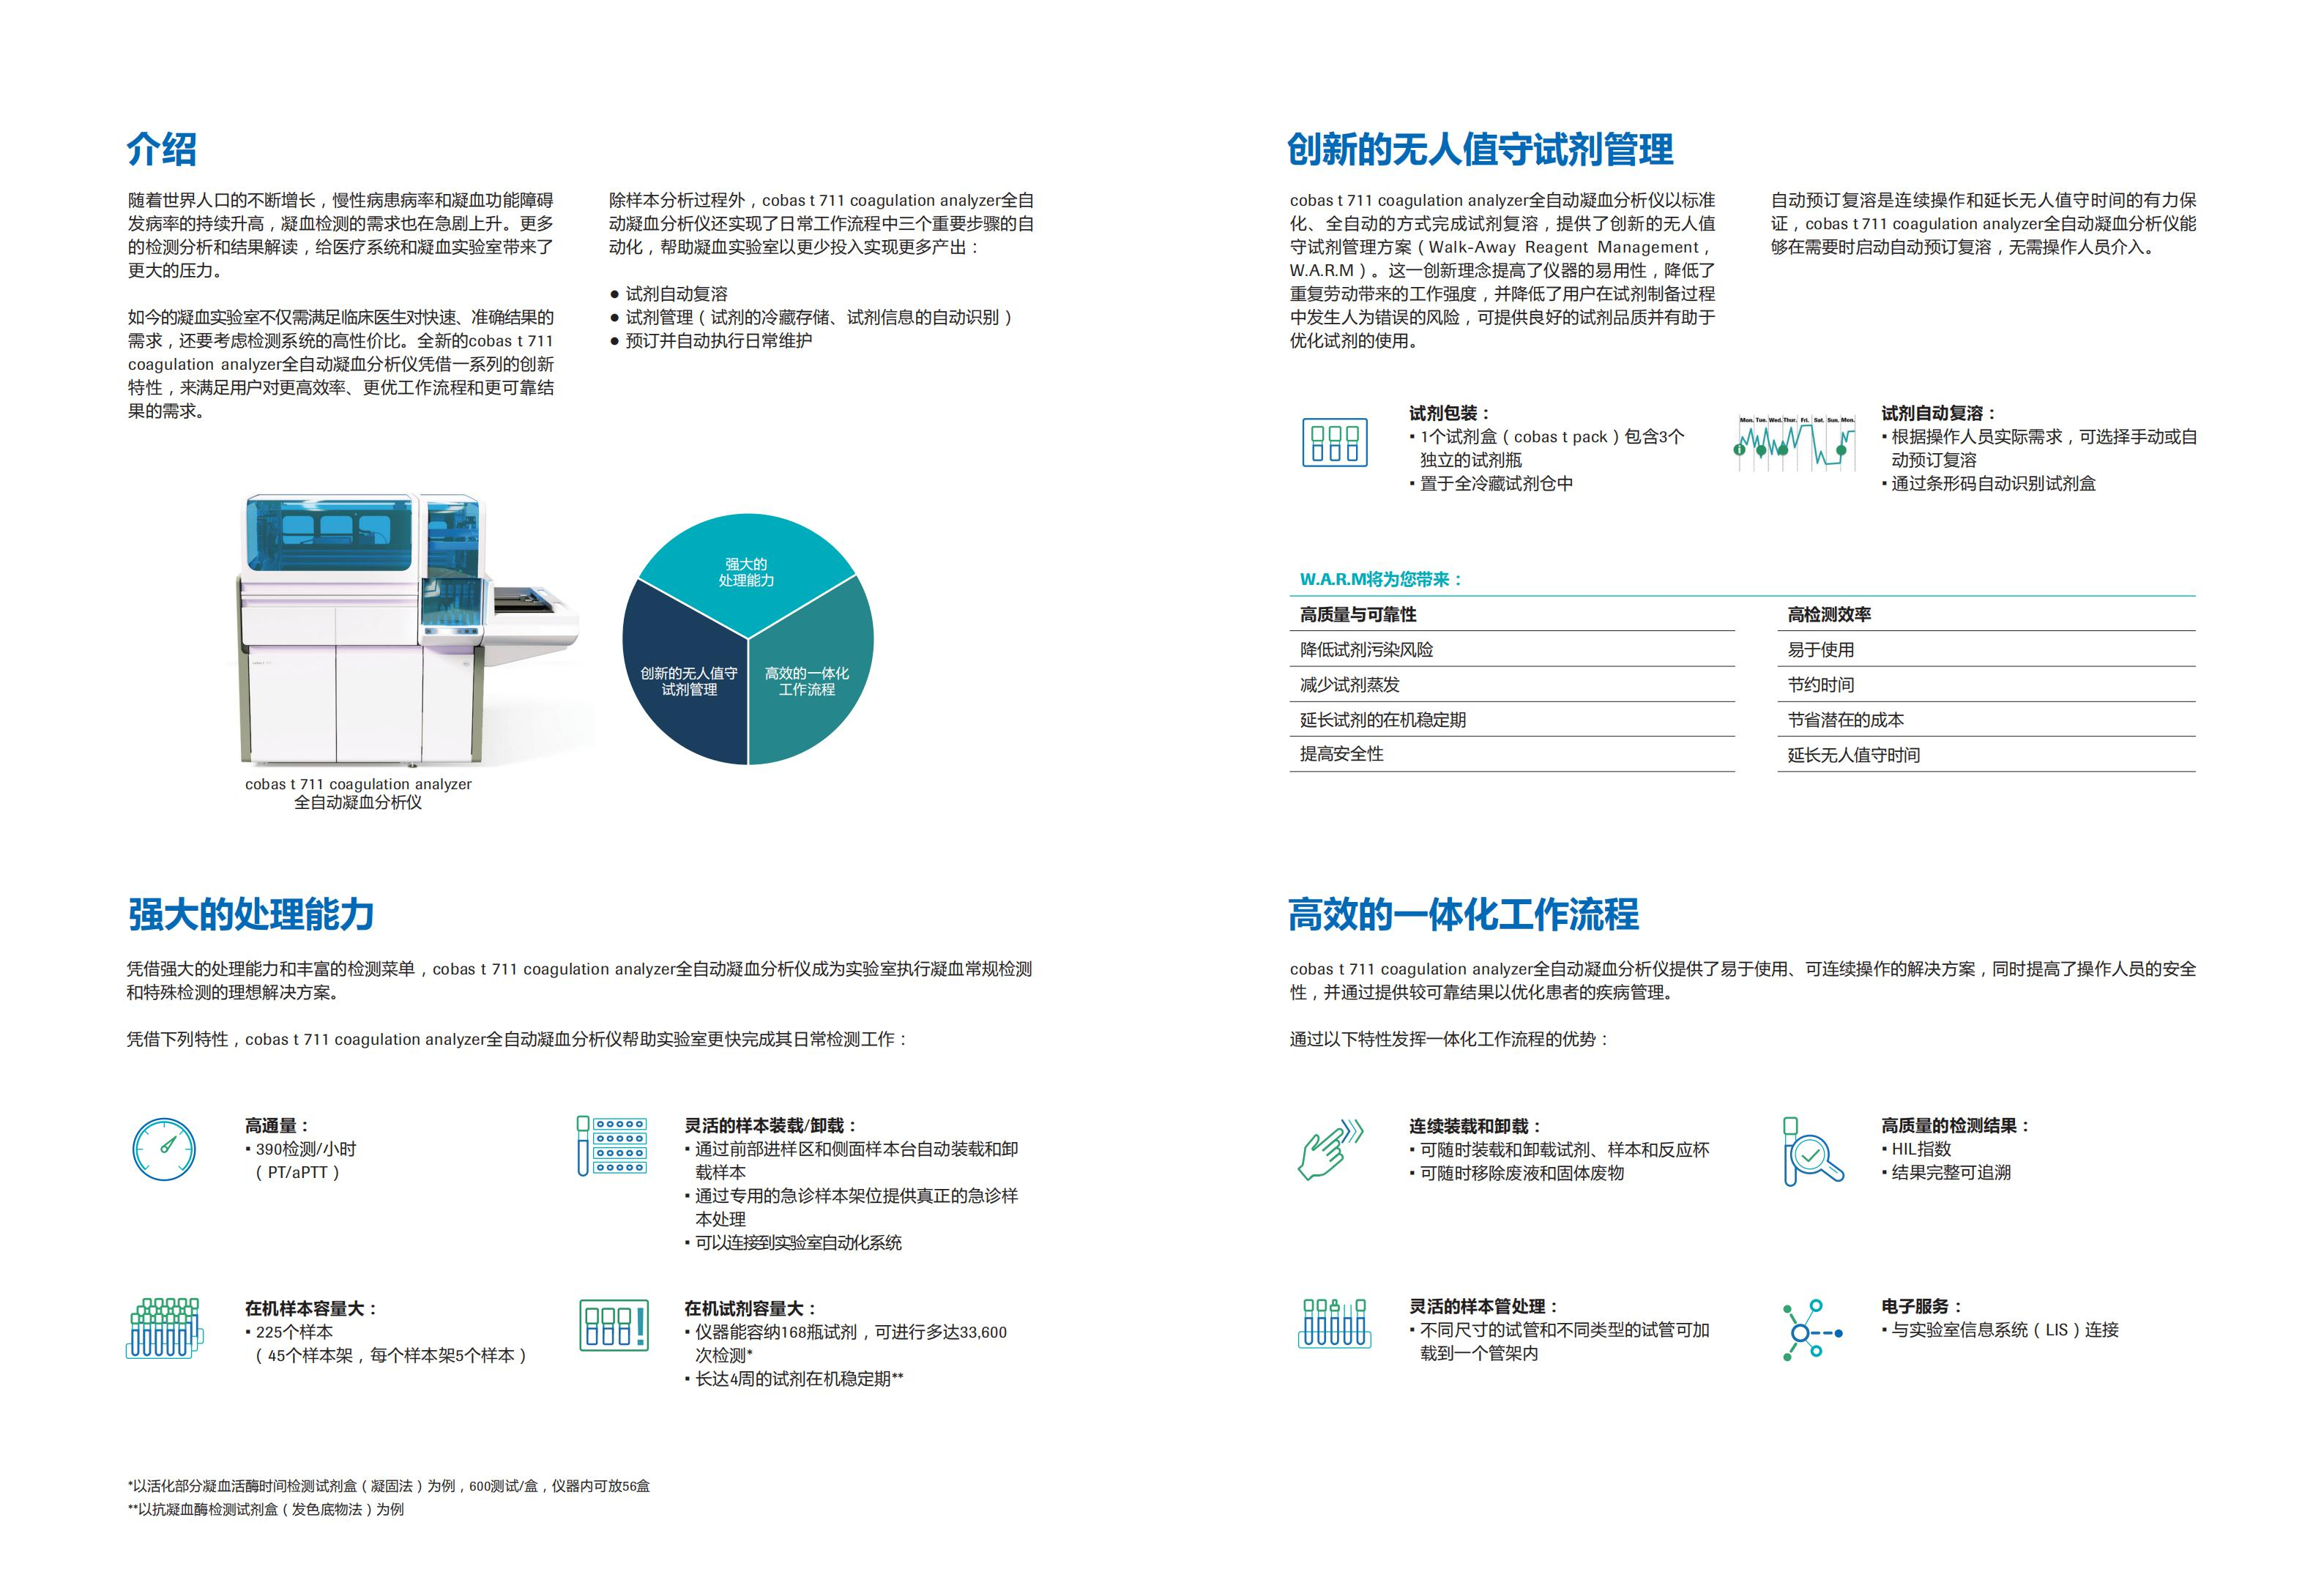 MN-CN-01049 cobas t 711 coagulation analyzer全自动凝血分析仪-Exp date 20250428_01.jpg